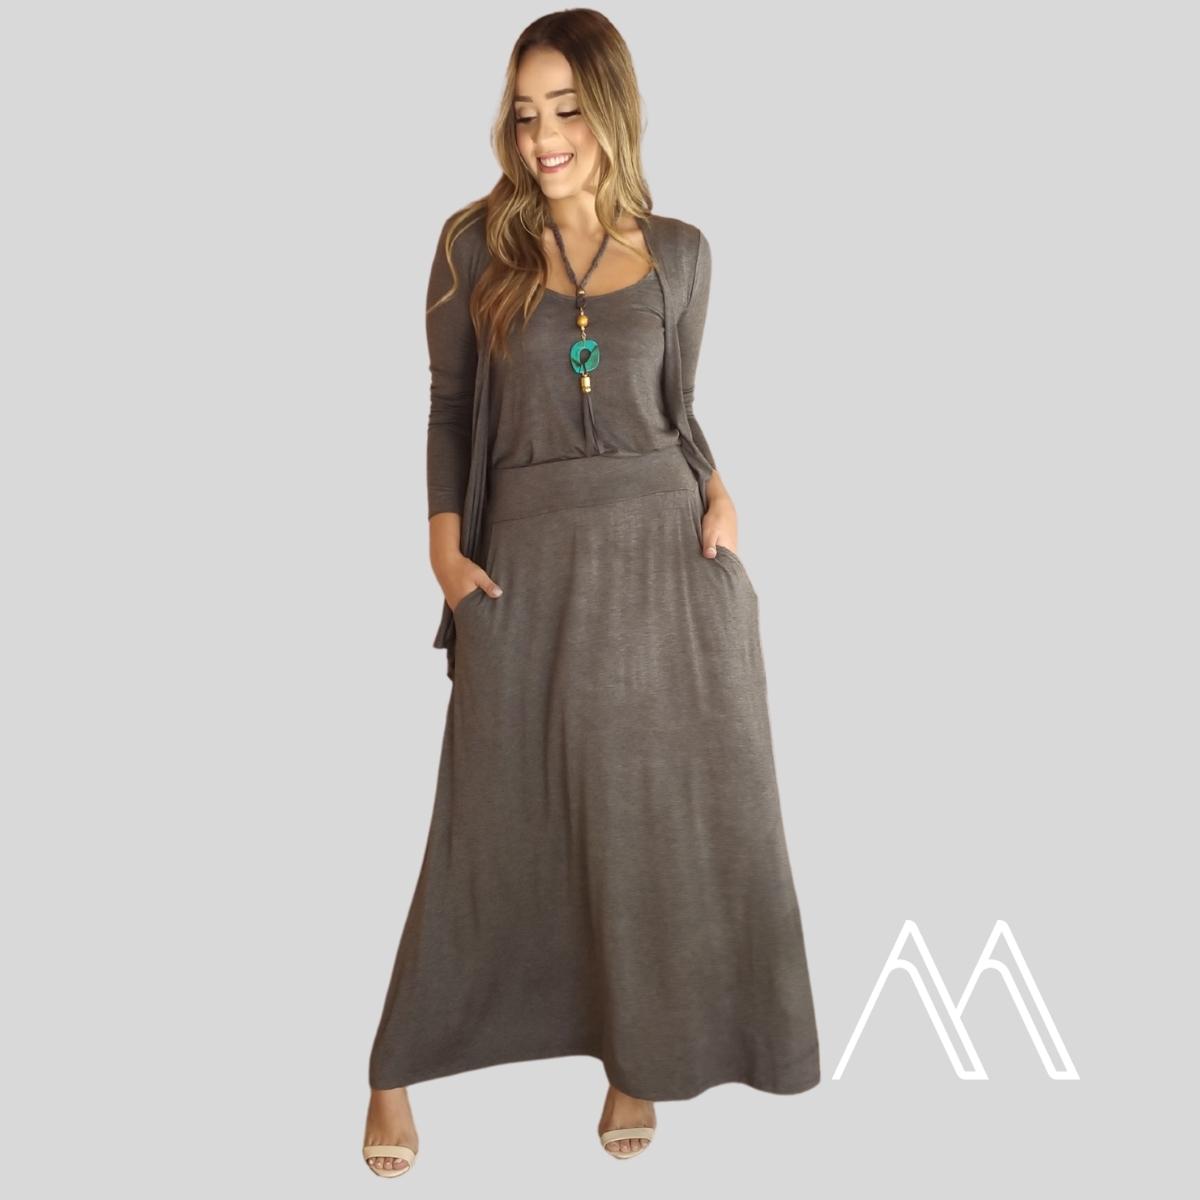 Twin Set Regata + Cardigan Malha Moda Feminina Inverno 21 Kimono Sueter  - Mariáz